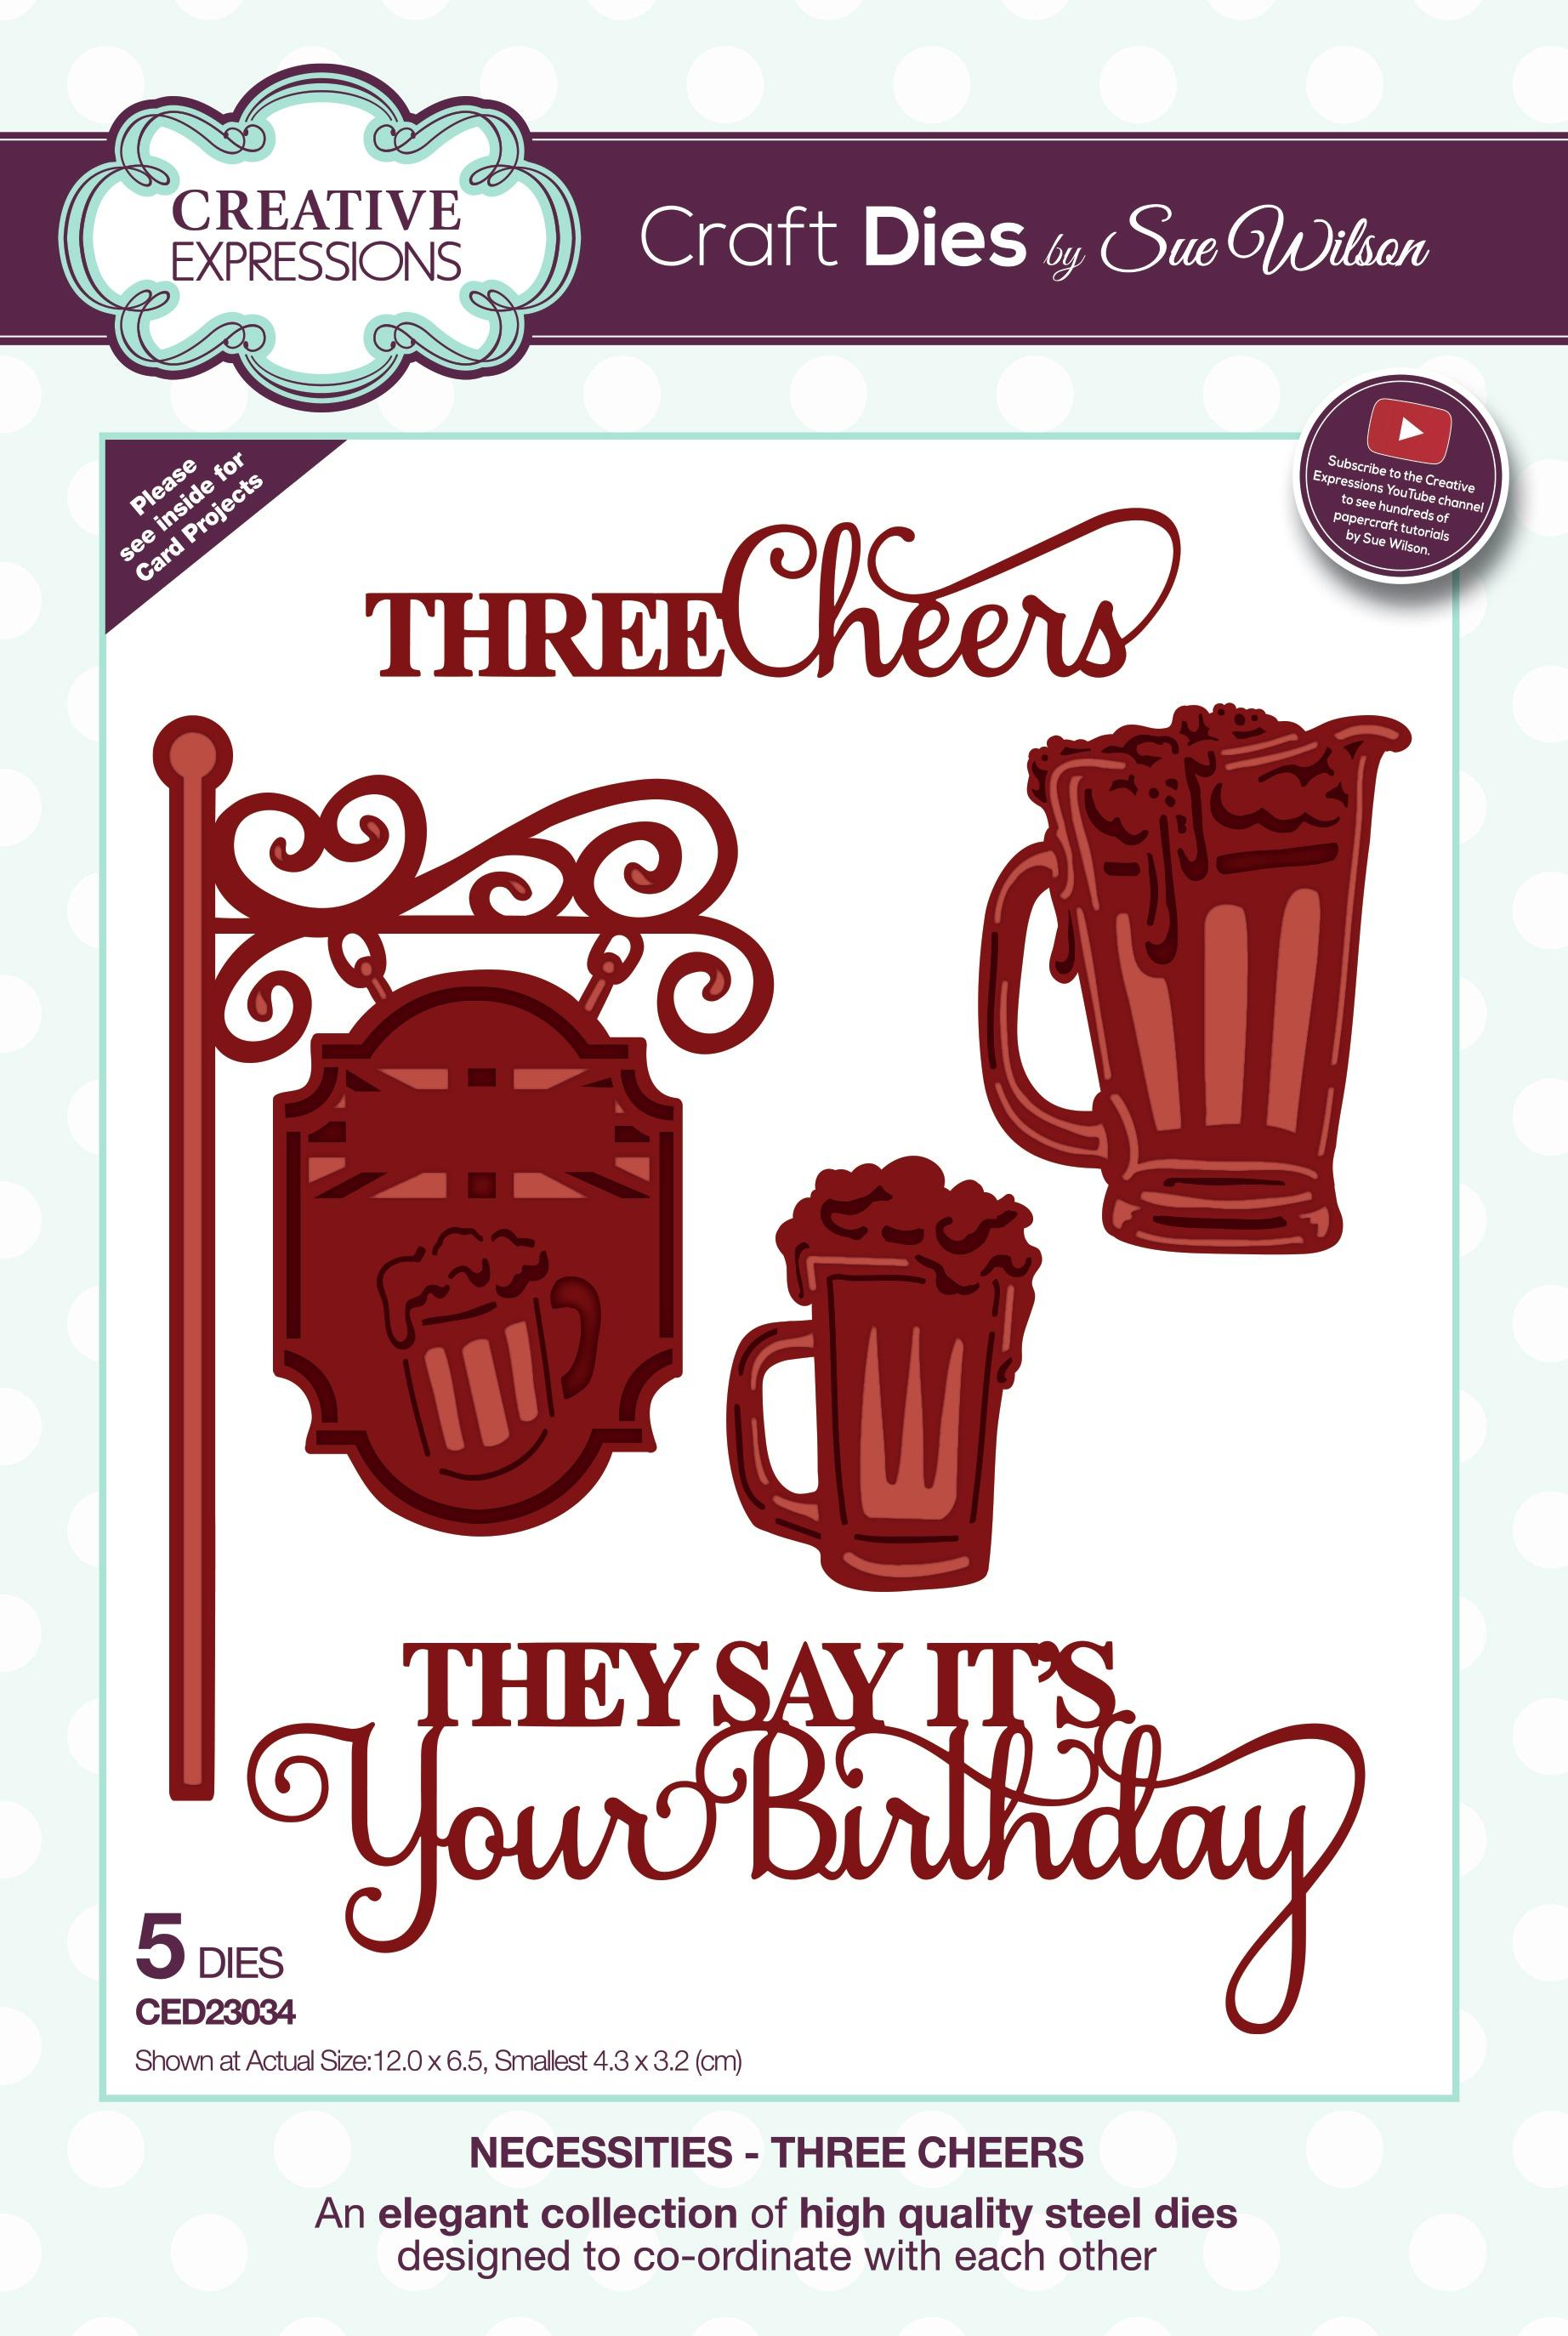 Creative Expressions Craft Dies By Sue Wilson-Necessities- Three Cheers